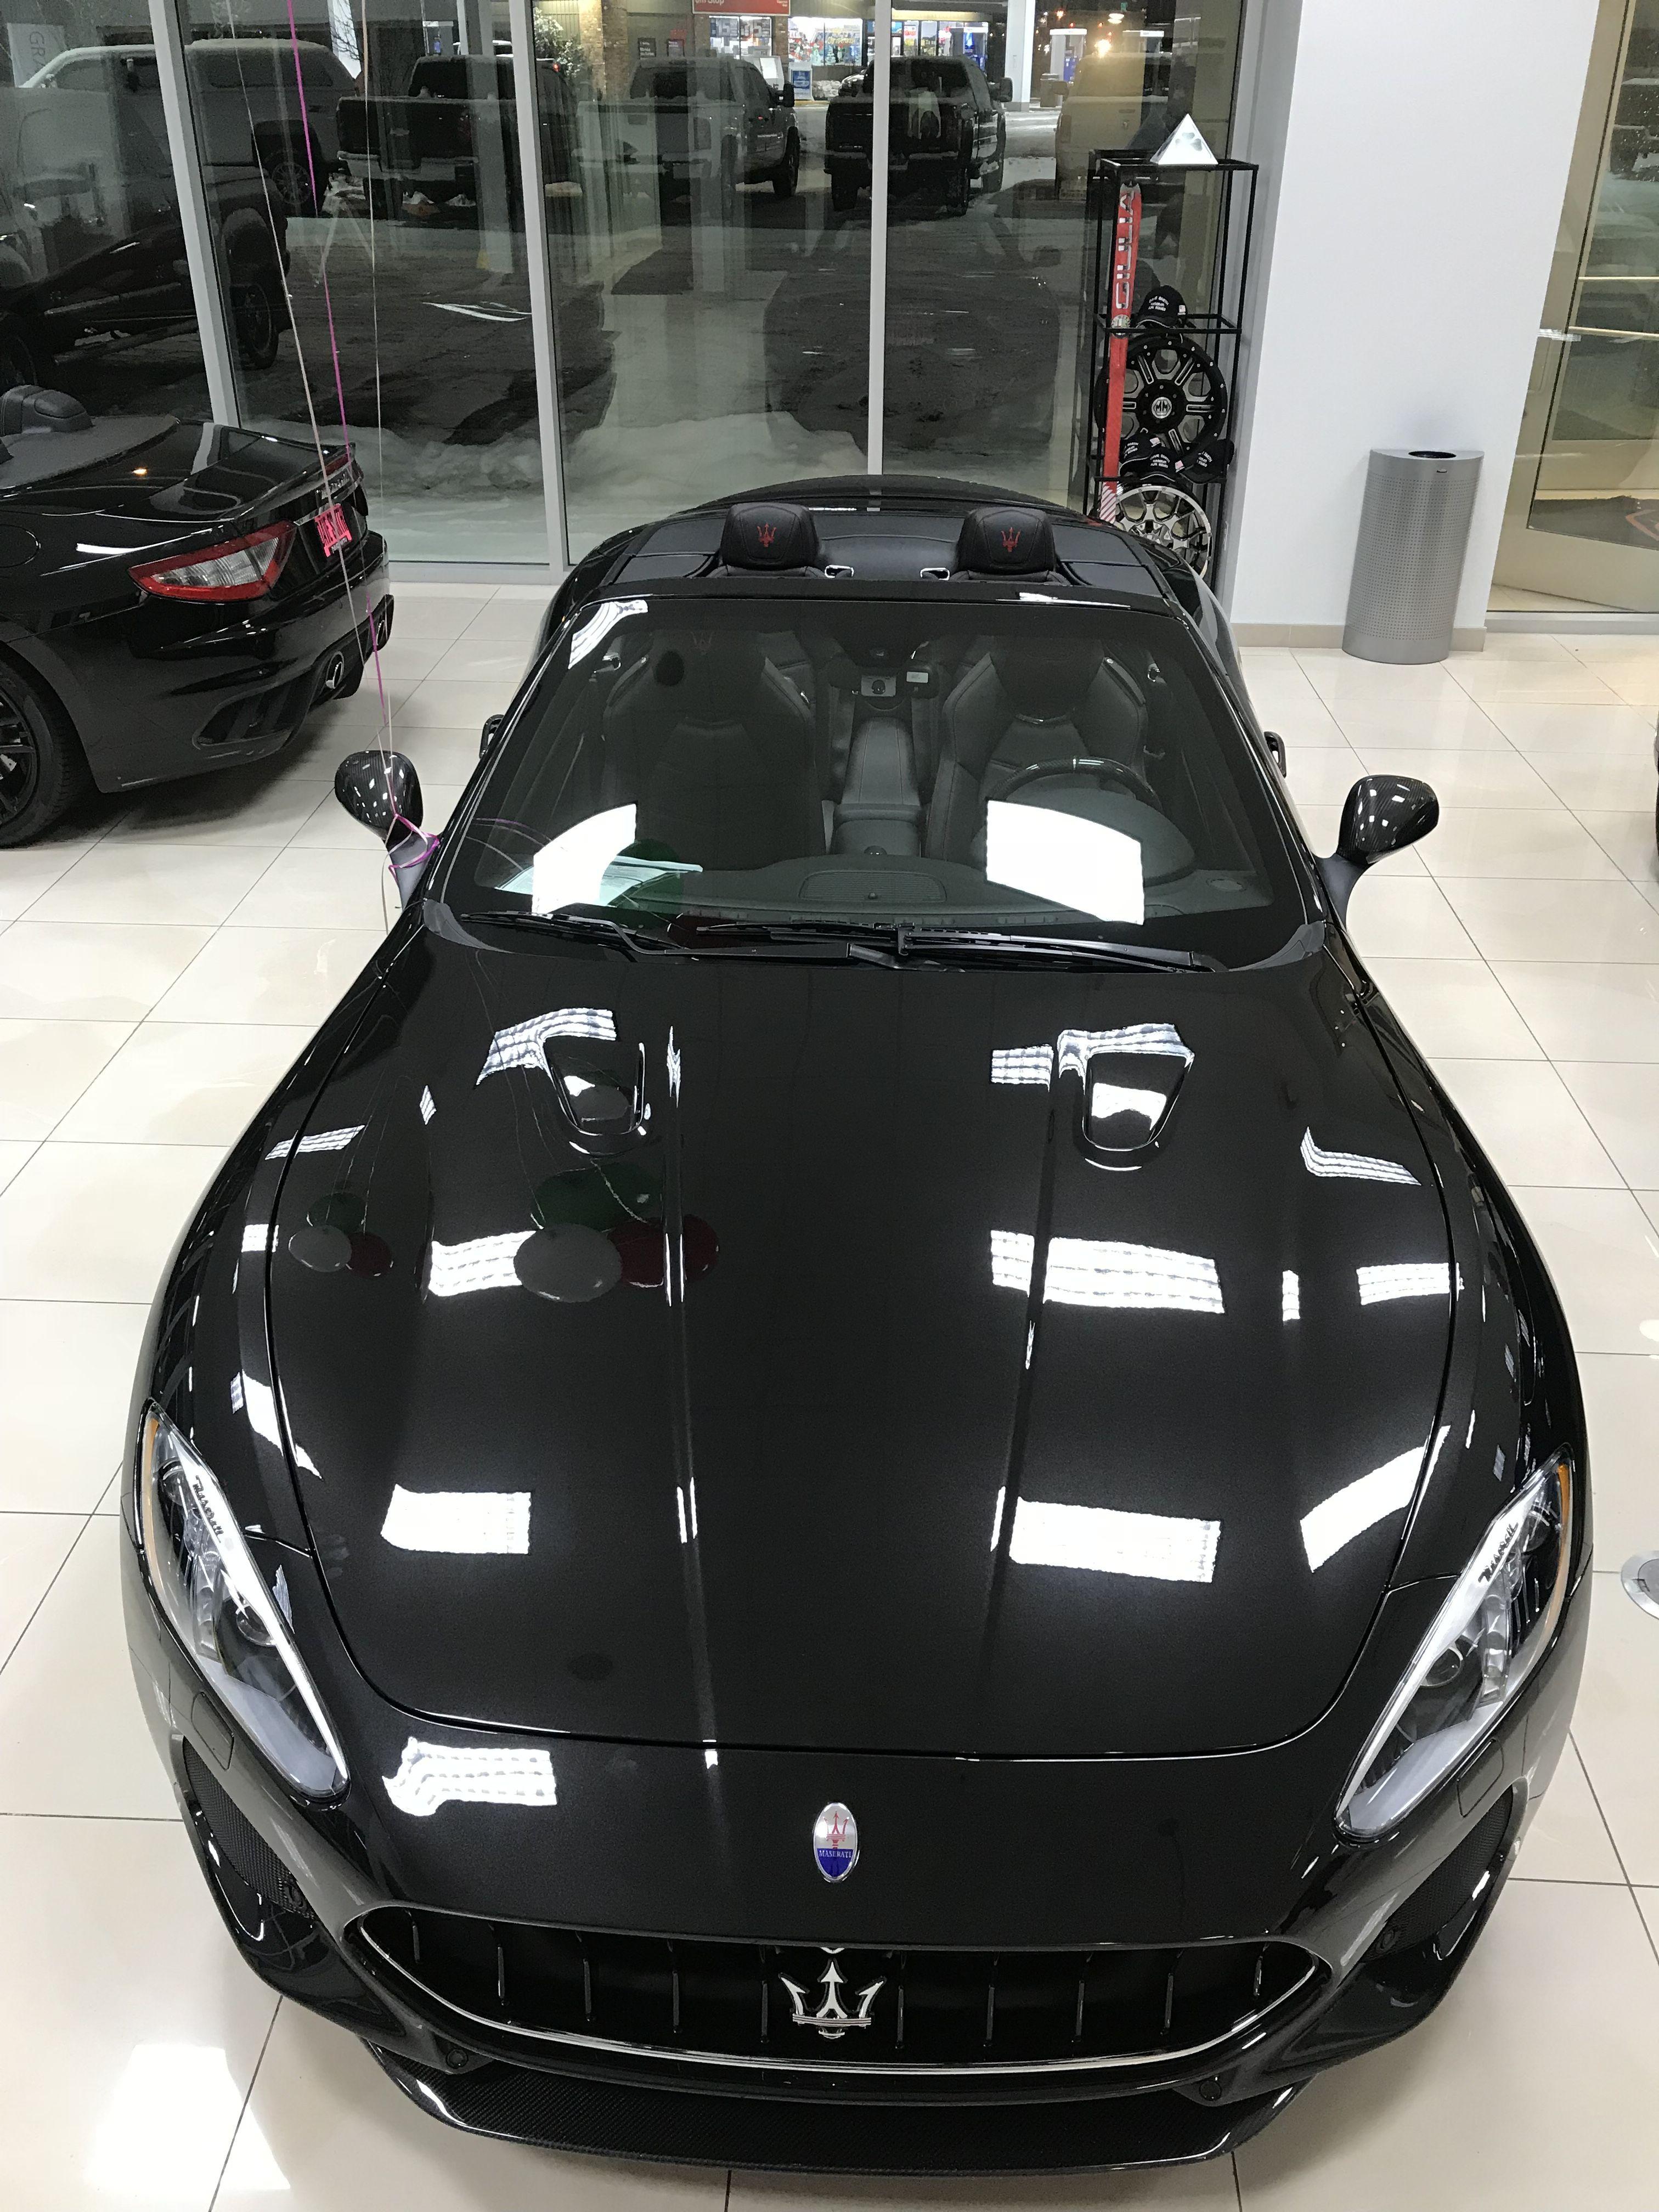 2018 Maserati Granturismo Mc Sportline Skyhook Suspension Full Carbon Fiber Pkg S And The Best Sounding Exhaust W Maserati Granturismo Maserati Gt Maserati